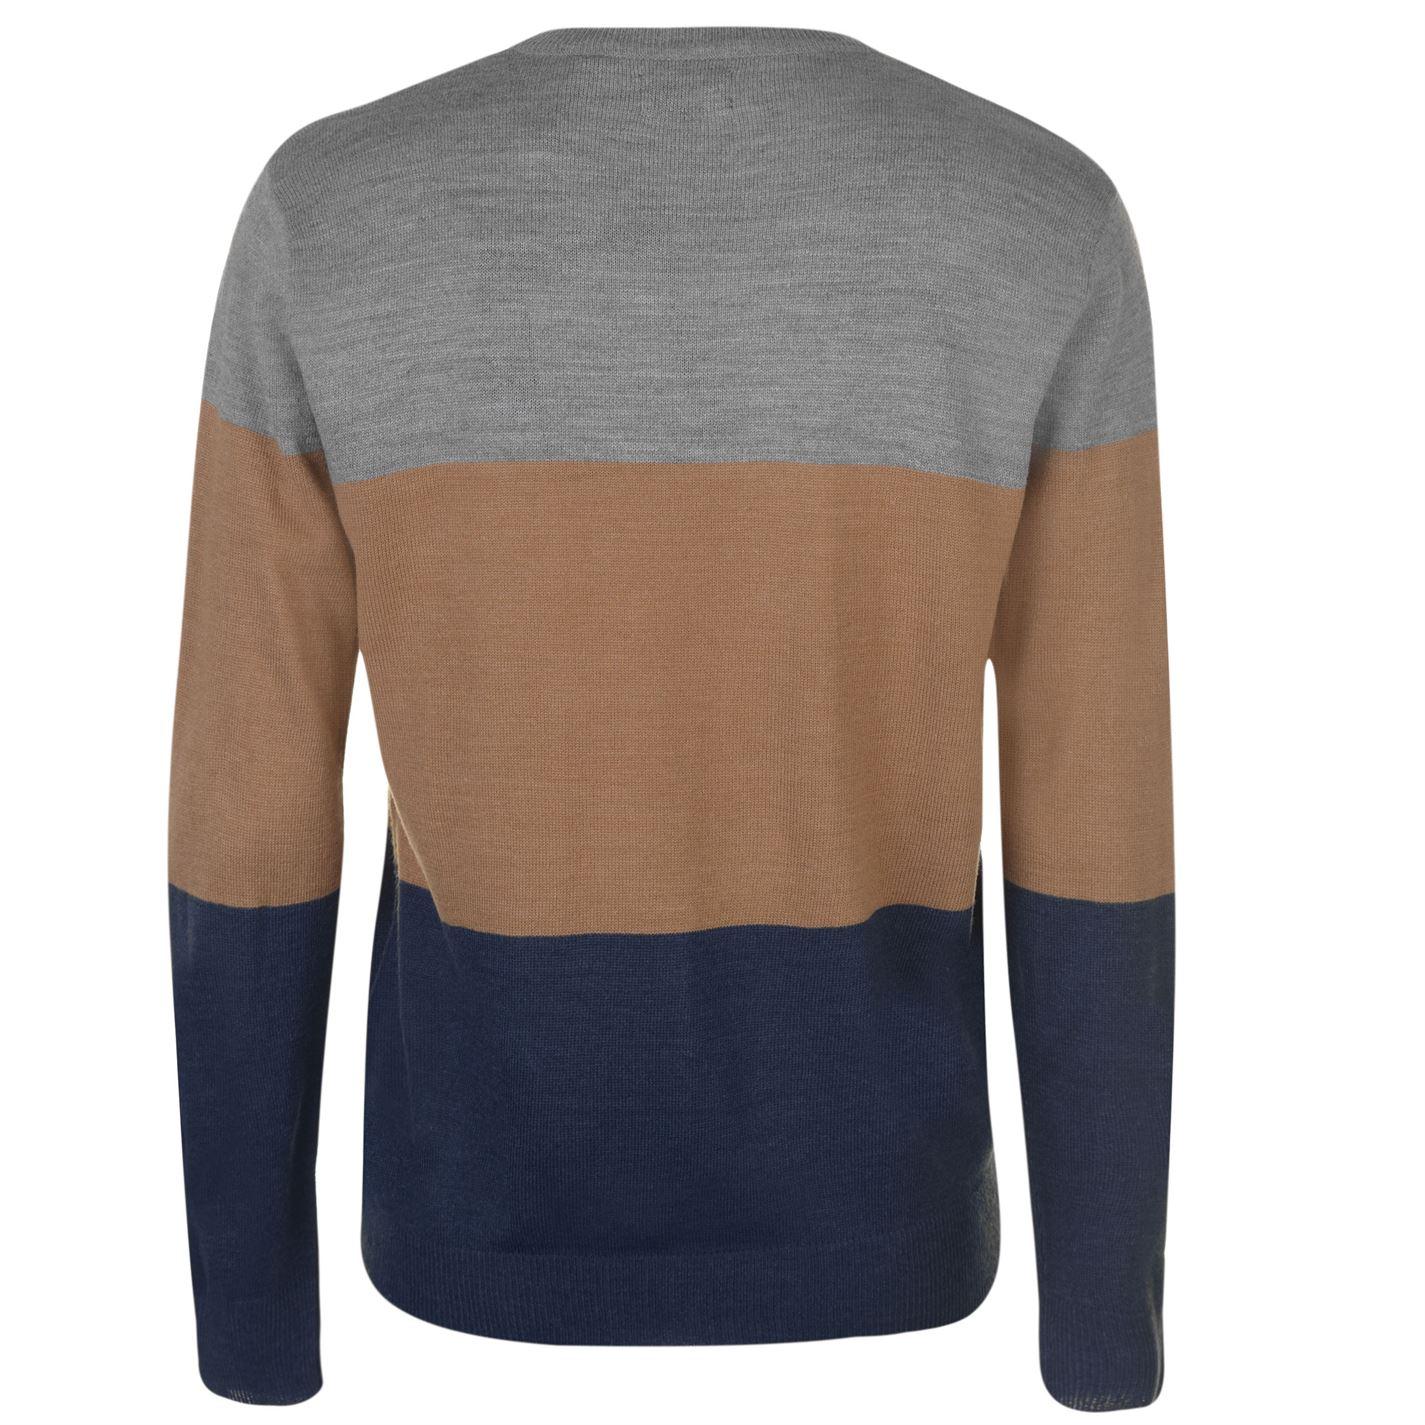 Pierre Cardin Mens Block Colour V Neck Knit Jumper Sweater Pullover Regular Fit